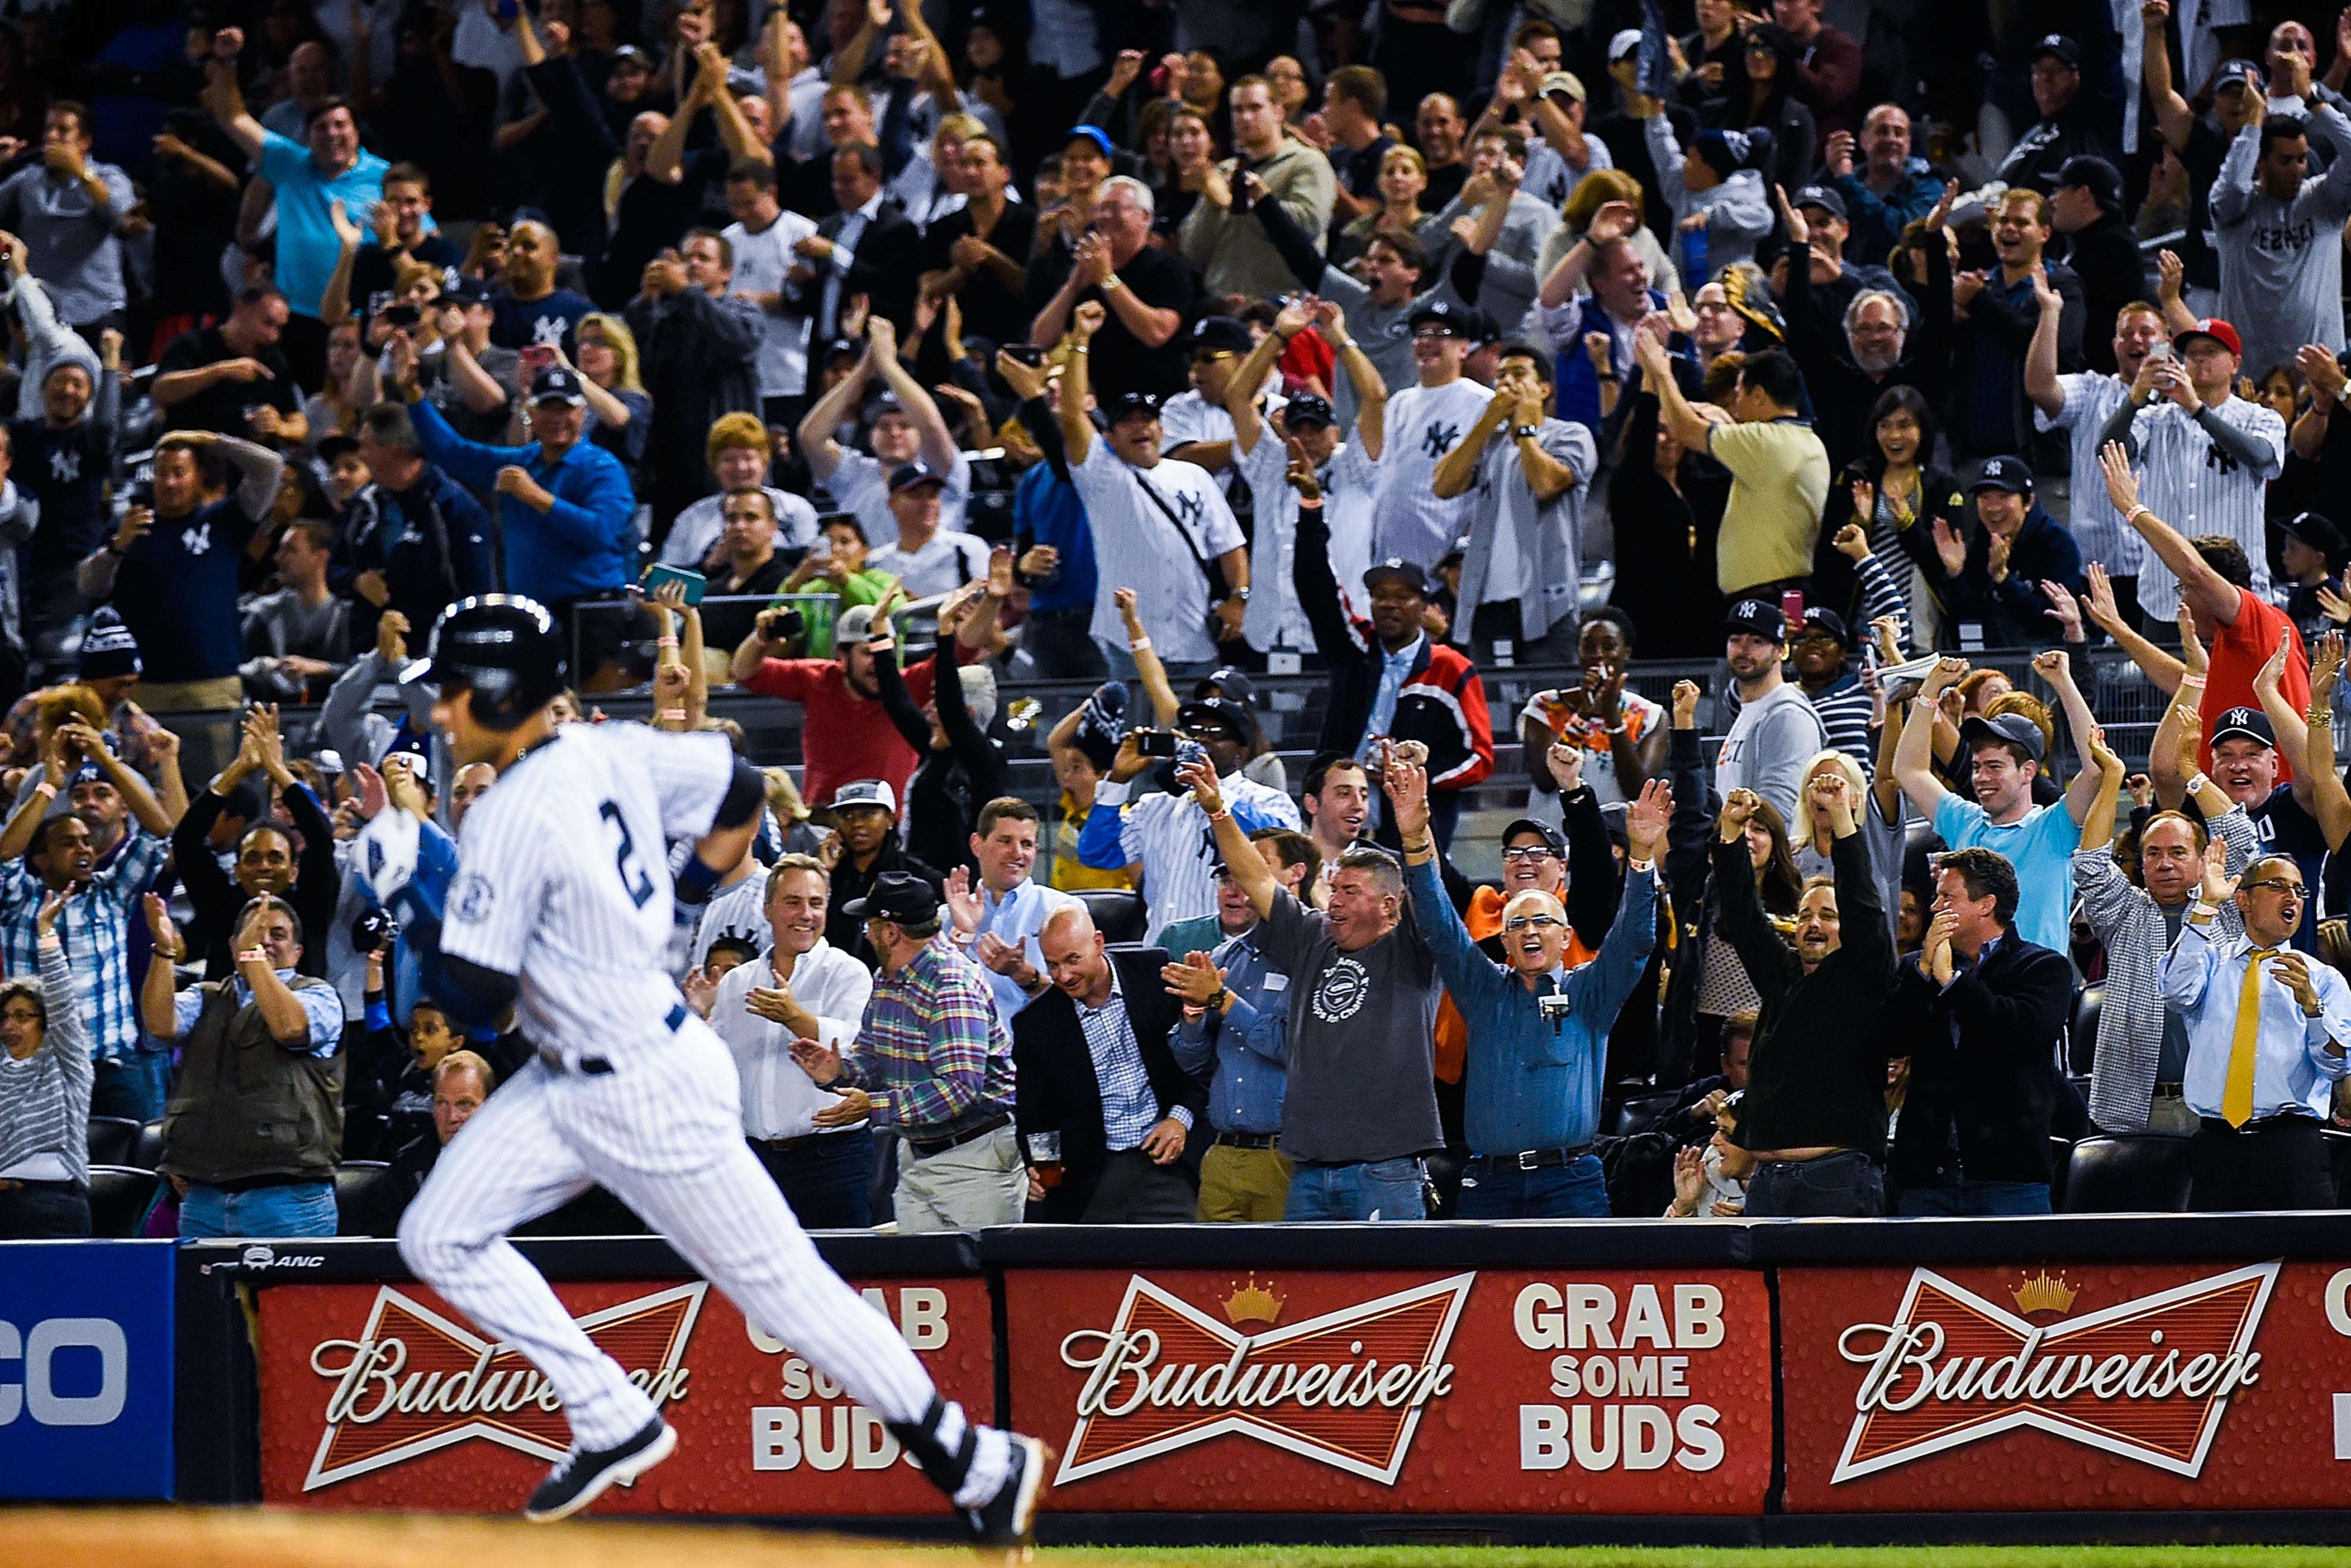 Derek Jeter hits first home run at Yankee Stadium in 2014